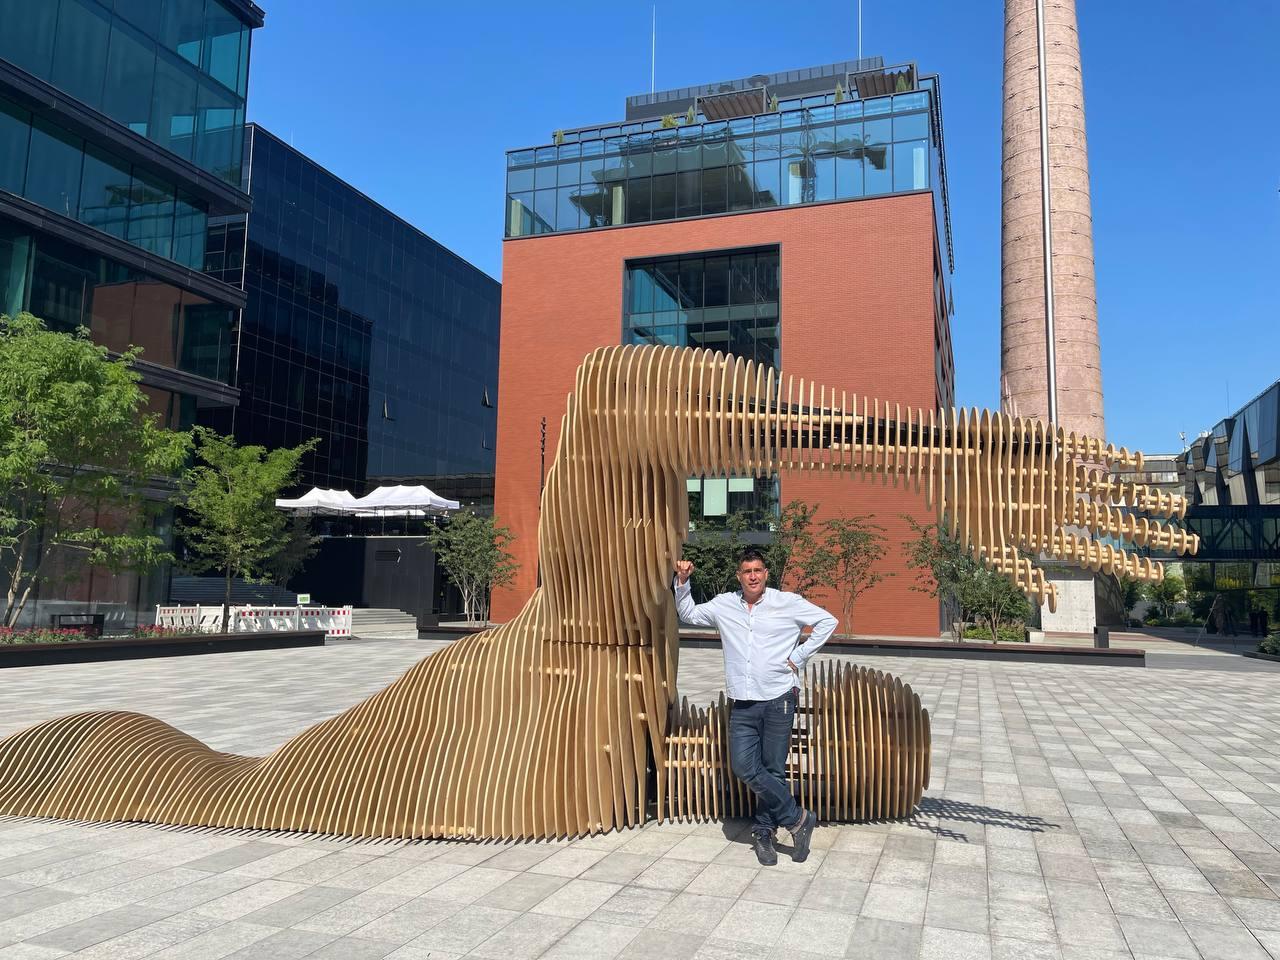 Скульптура Merman в UNIT.City